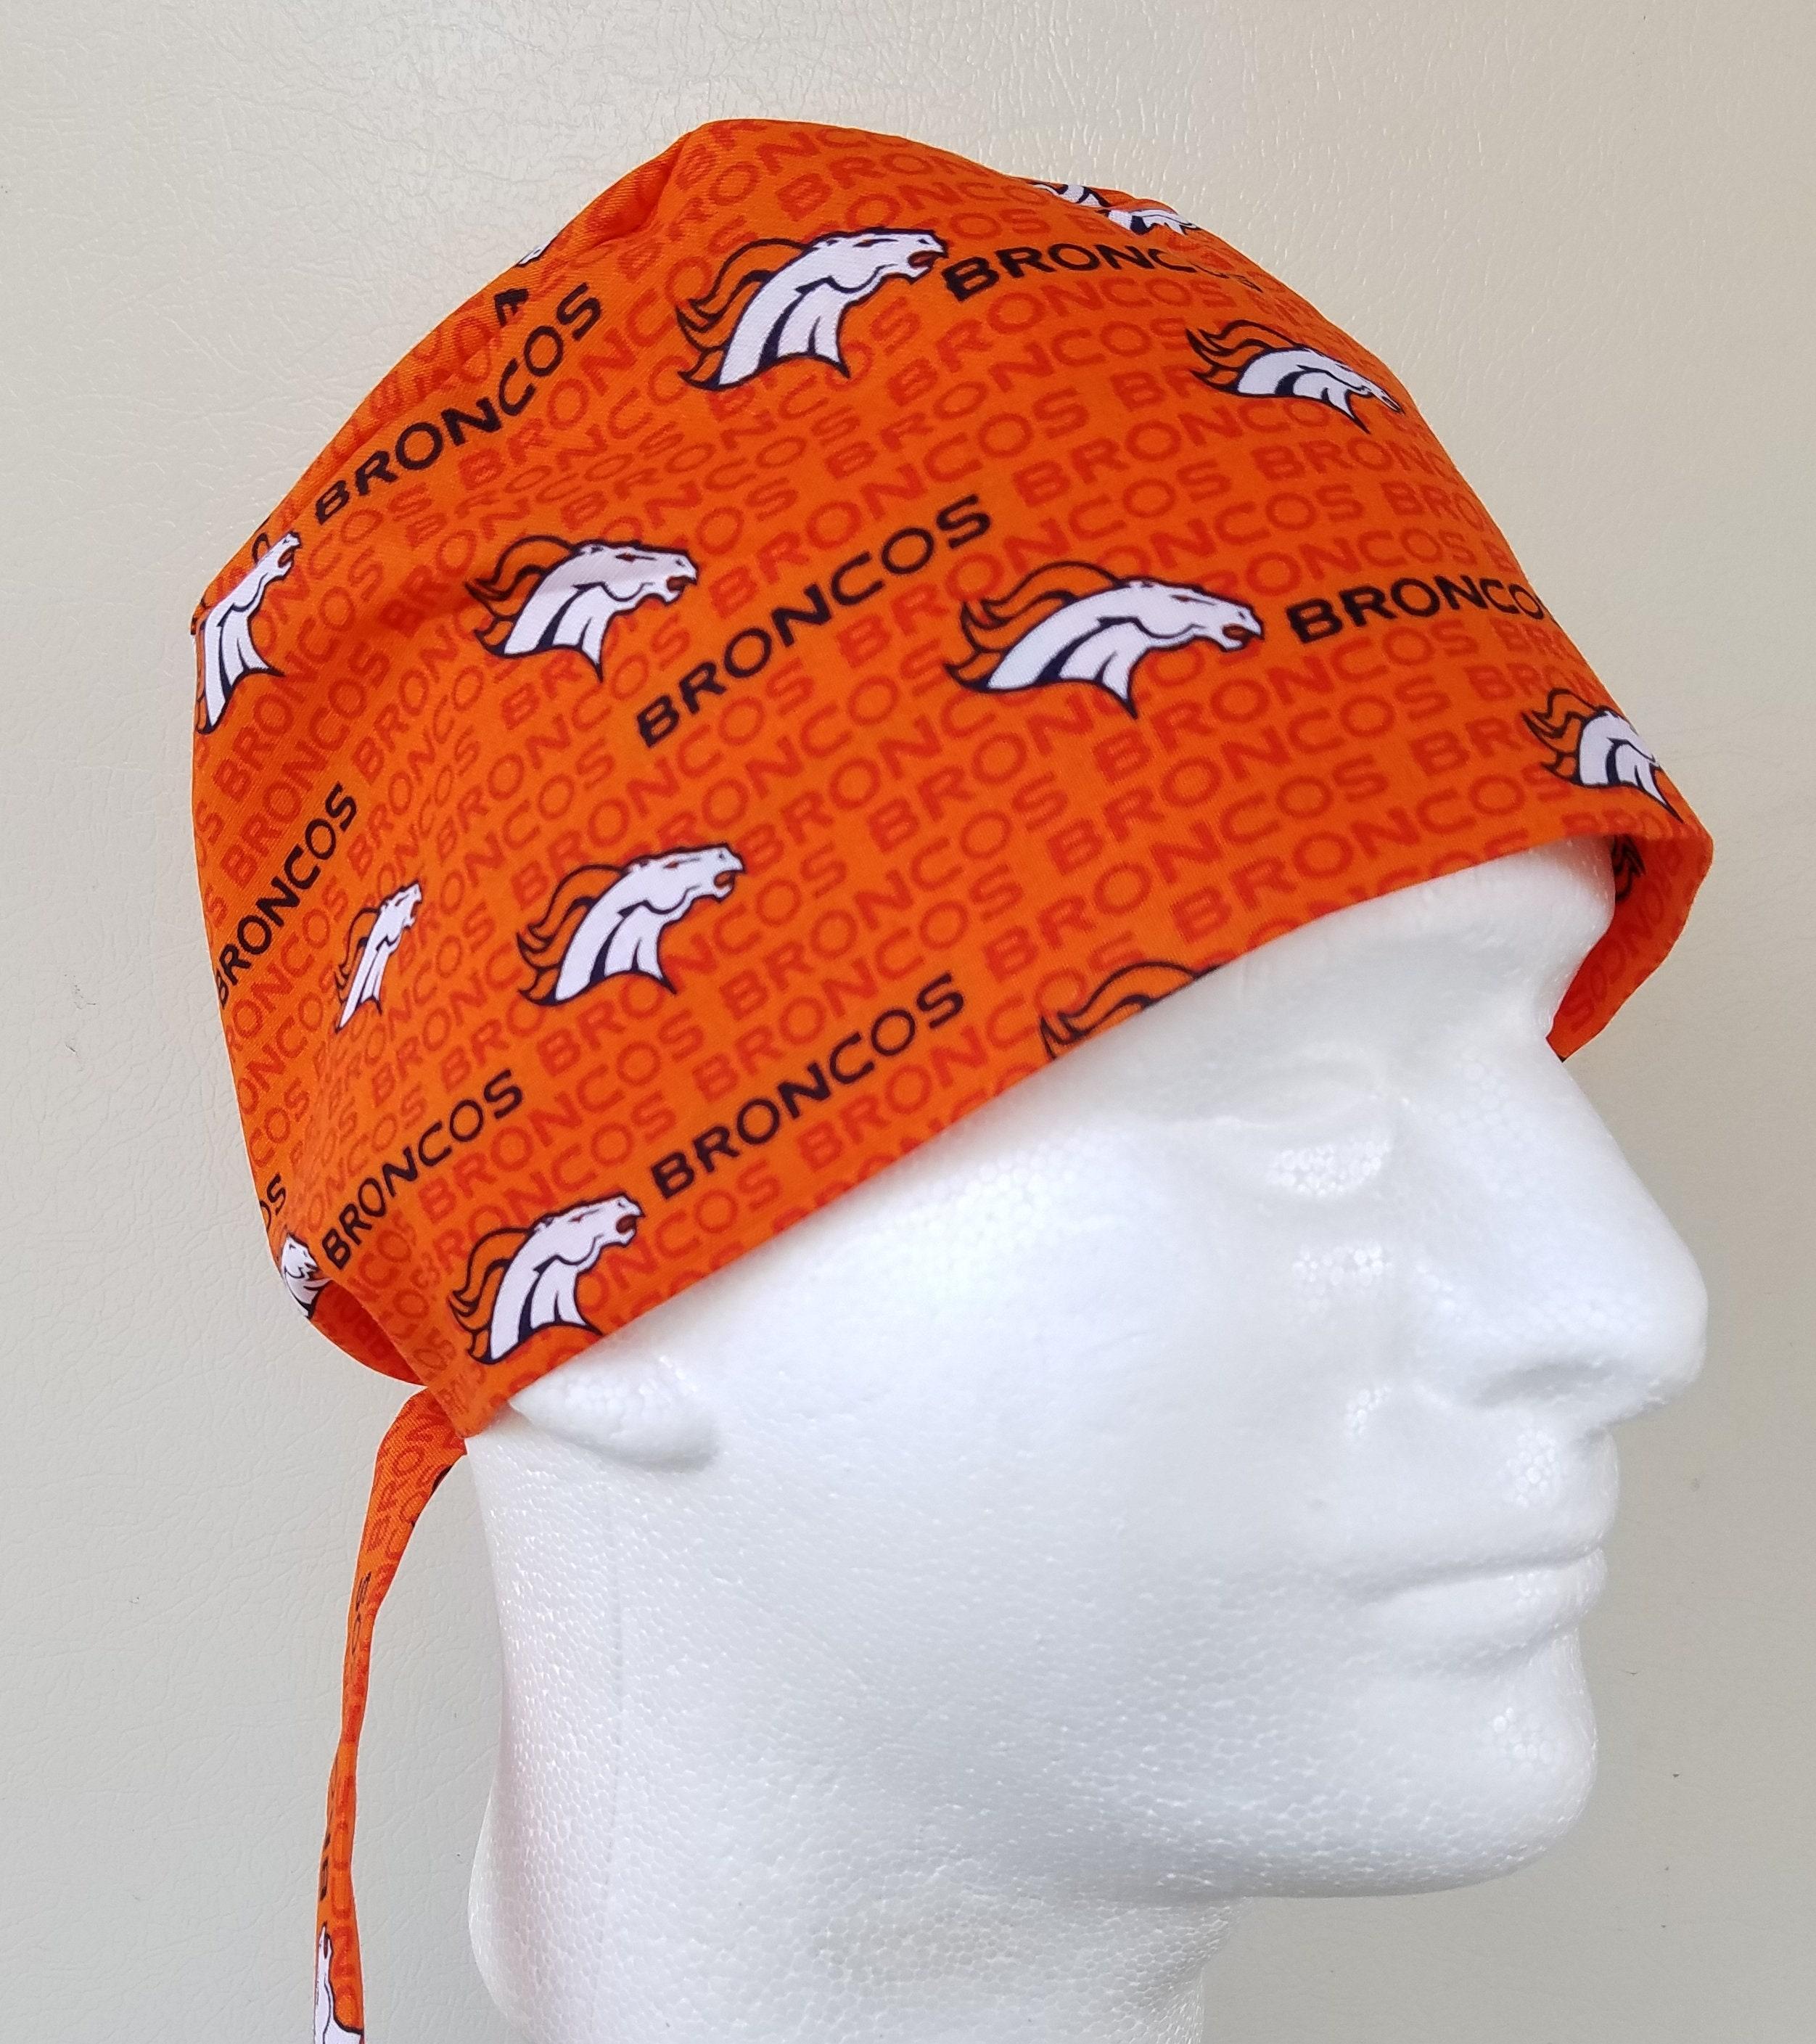 d80b304a1 Denver Broncos scrub hat, Mens surgical tie back scrub hat, scrub cap ...